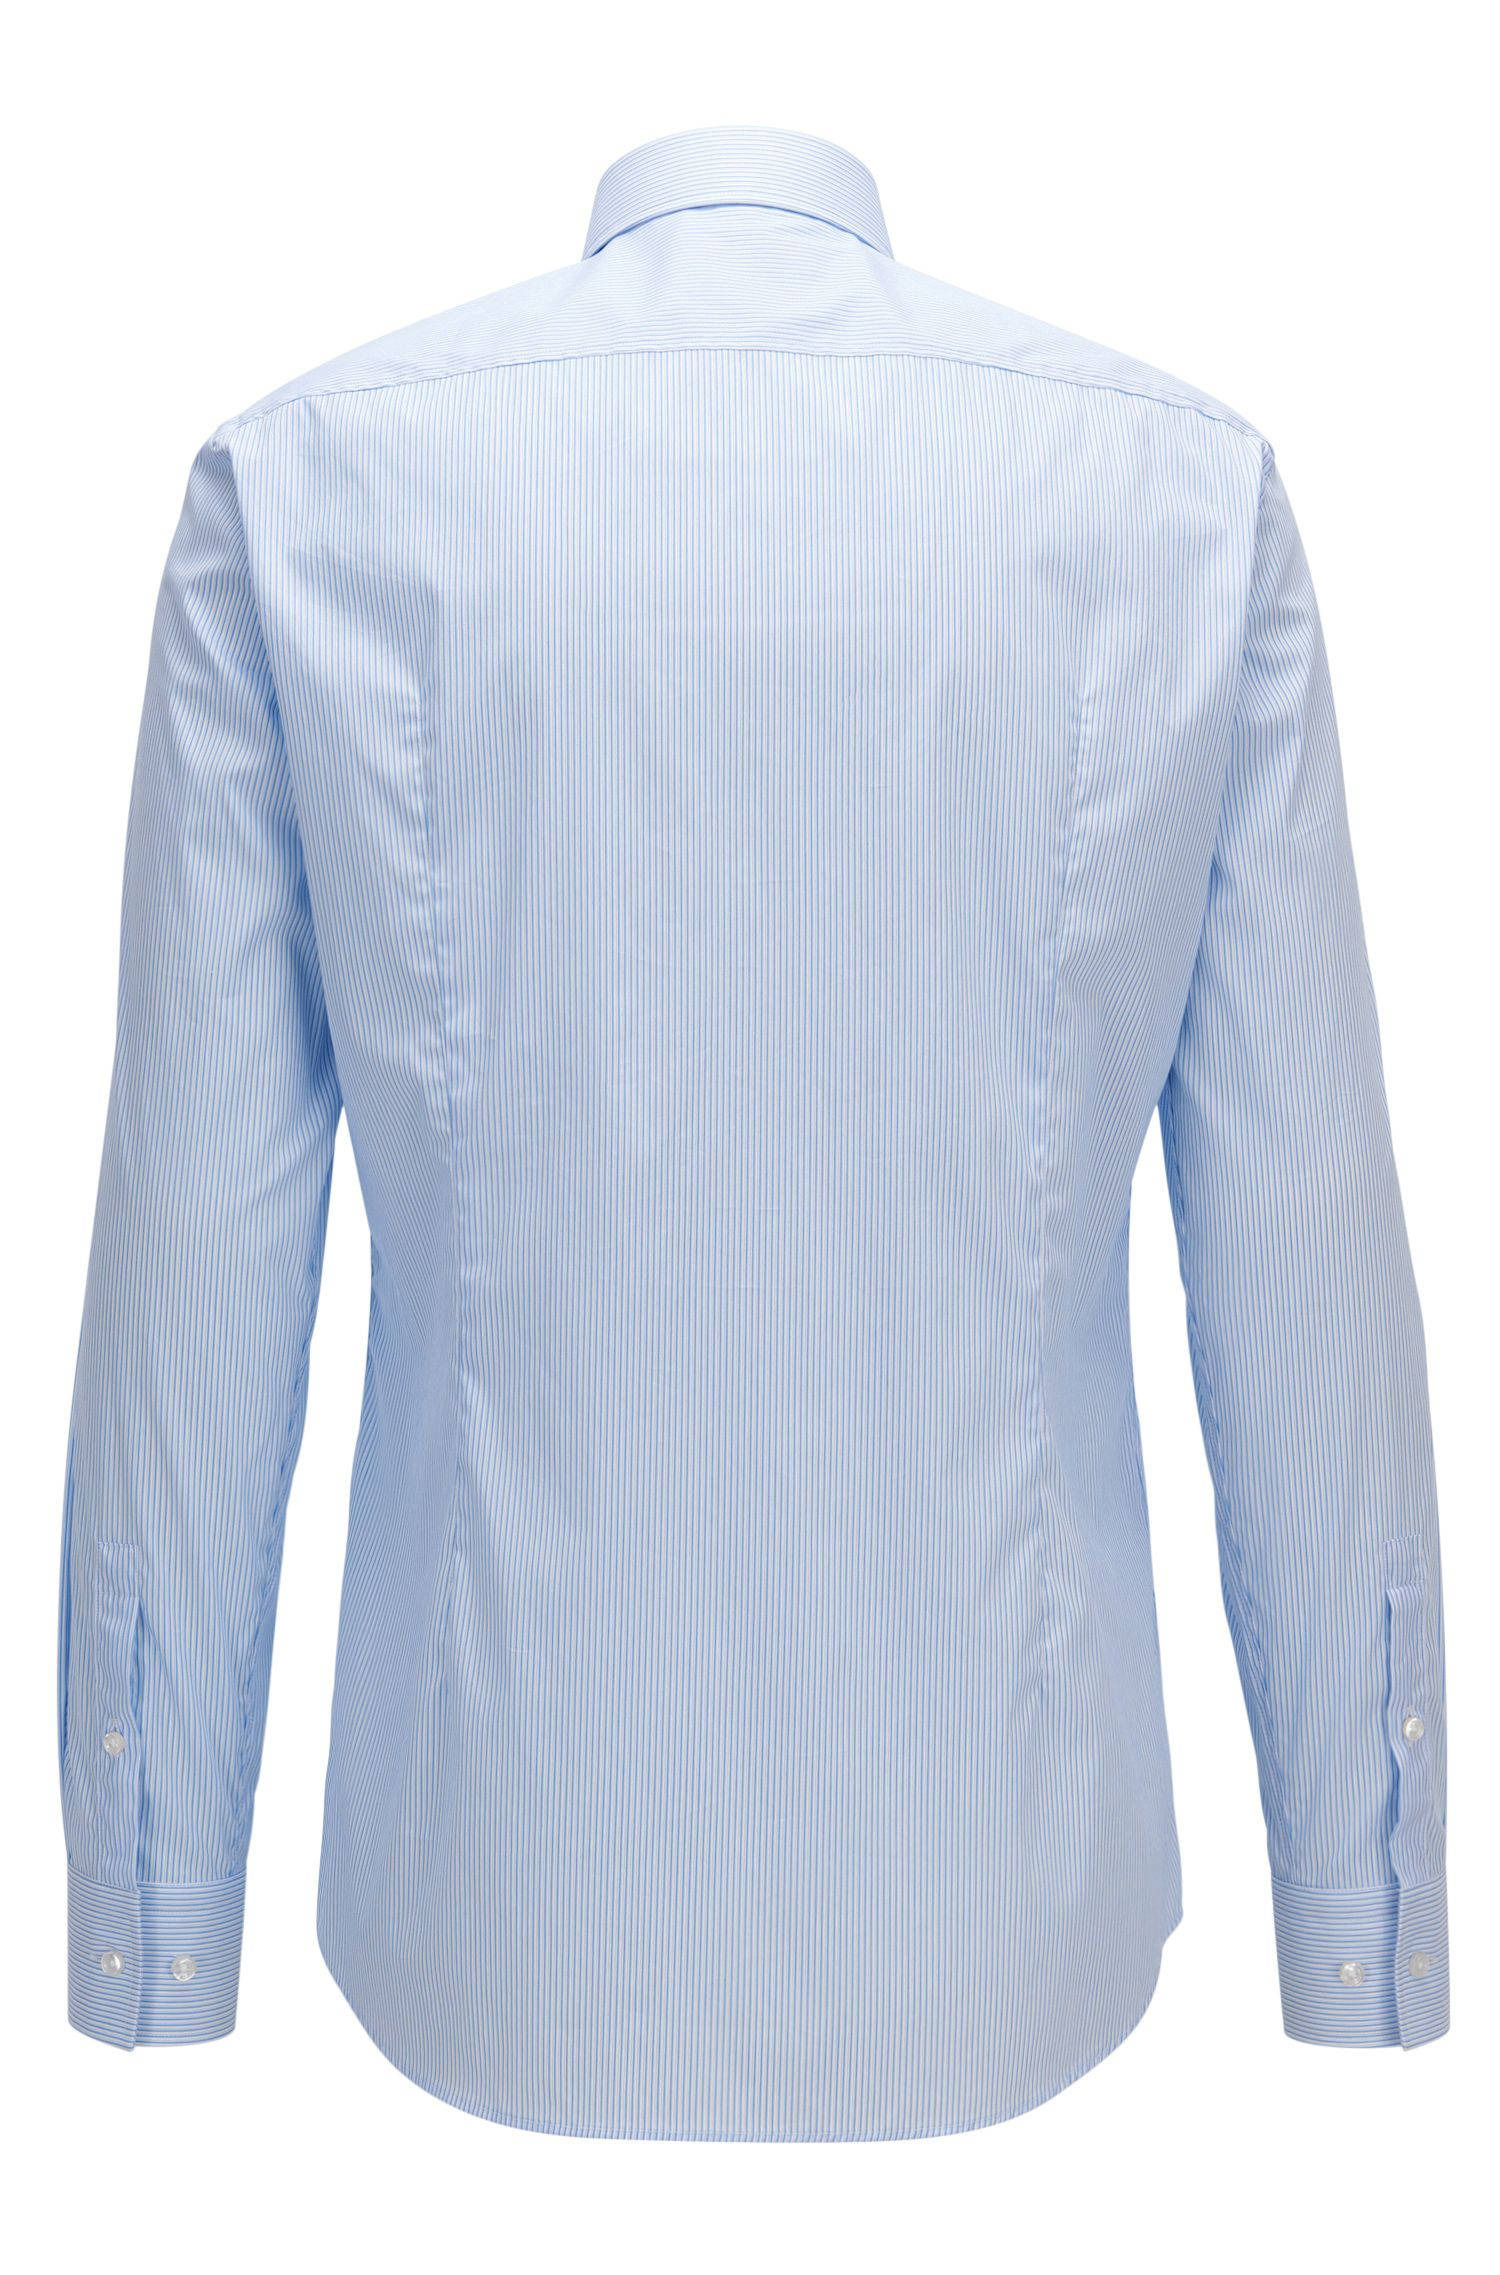 Pinstriped Stretch Cotton Dress Shirt, Slim Fit |  Jenno